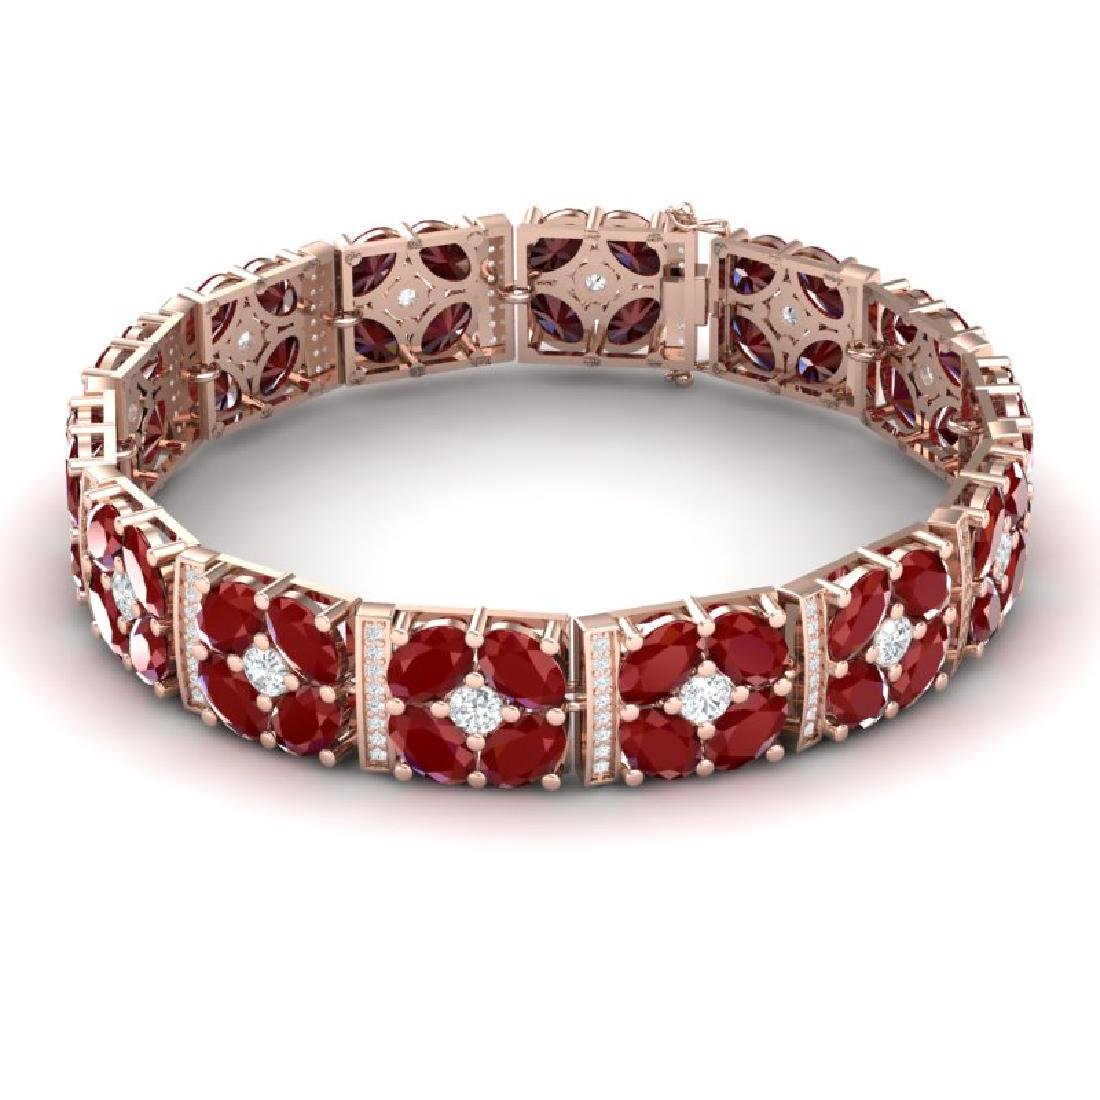 48.04 CTW Royalty Ruby & VS Diamond Bracelet 18K Rose - 3